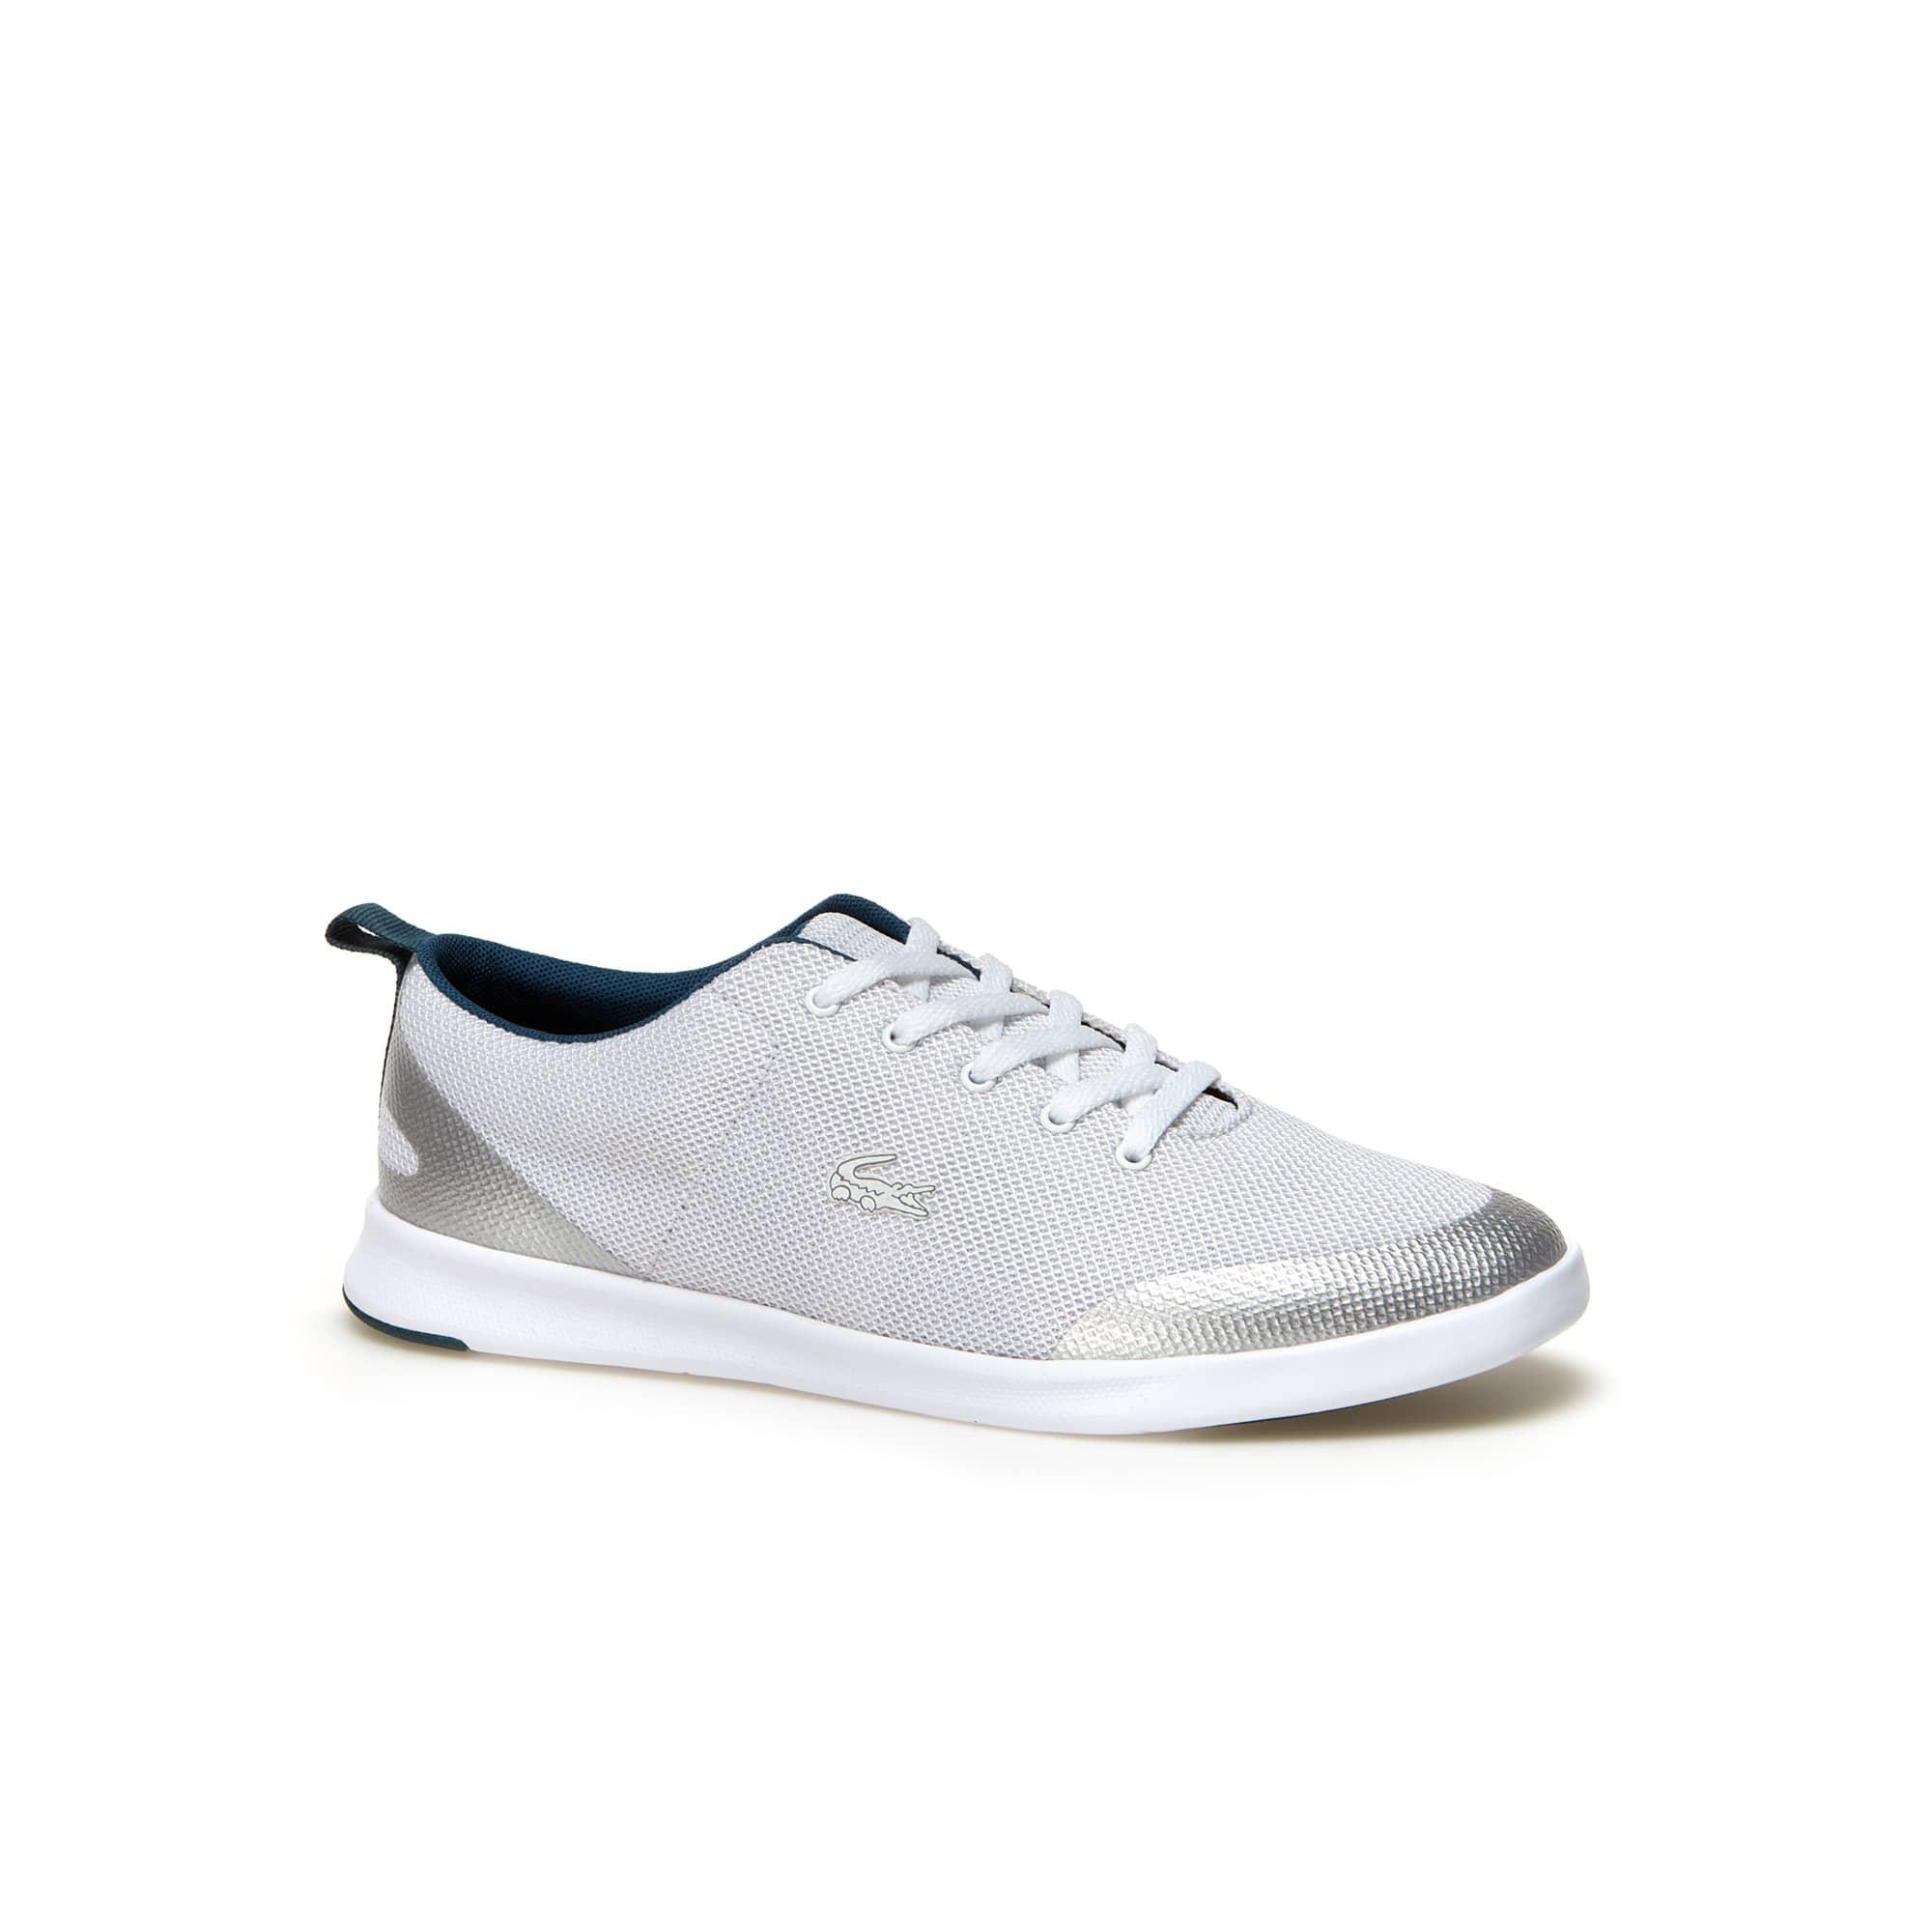 Women's Avenir Textile Sneakers